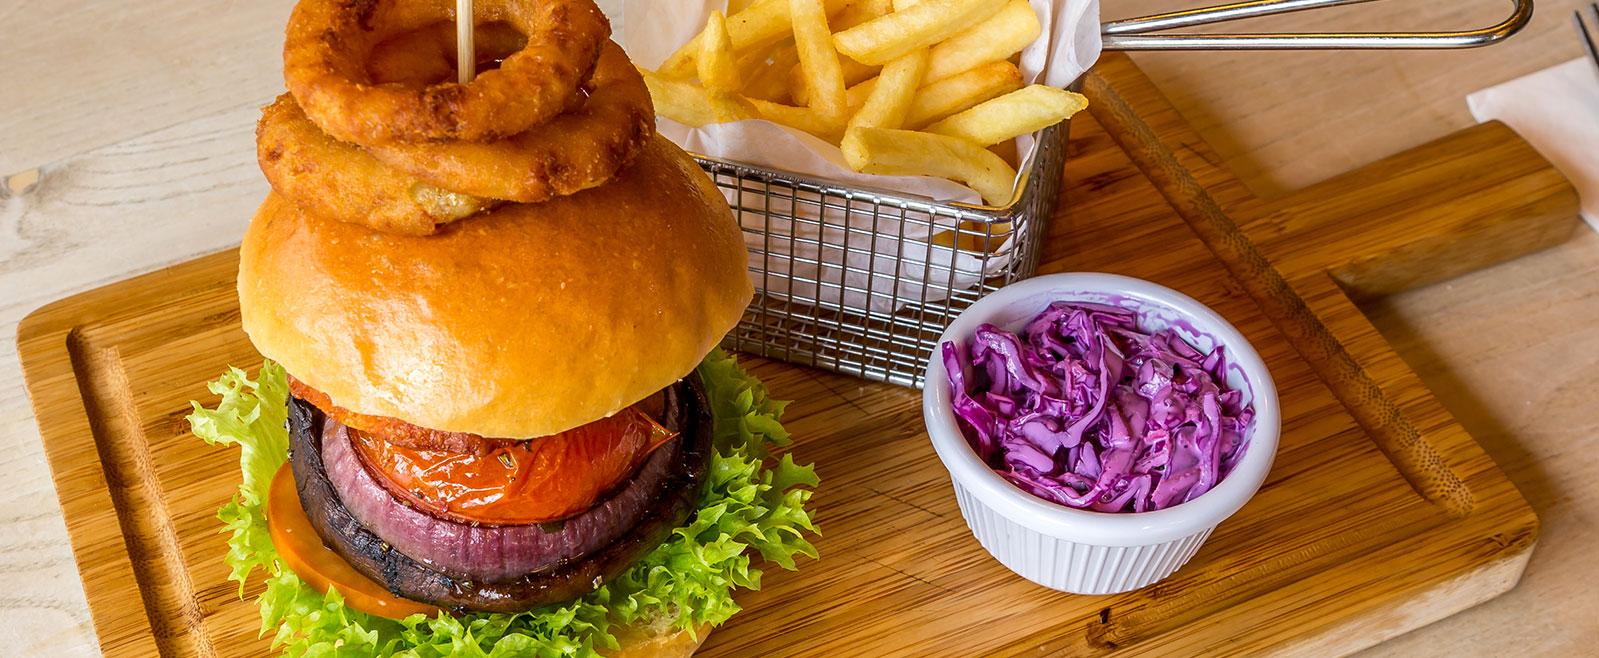 PiedBullFOODburger